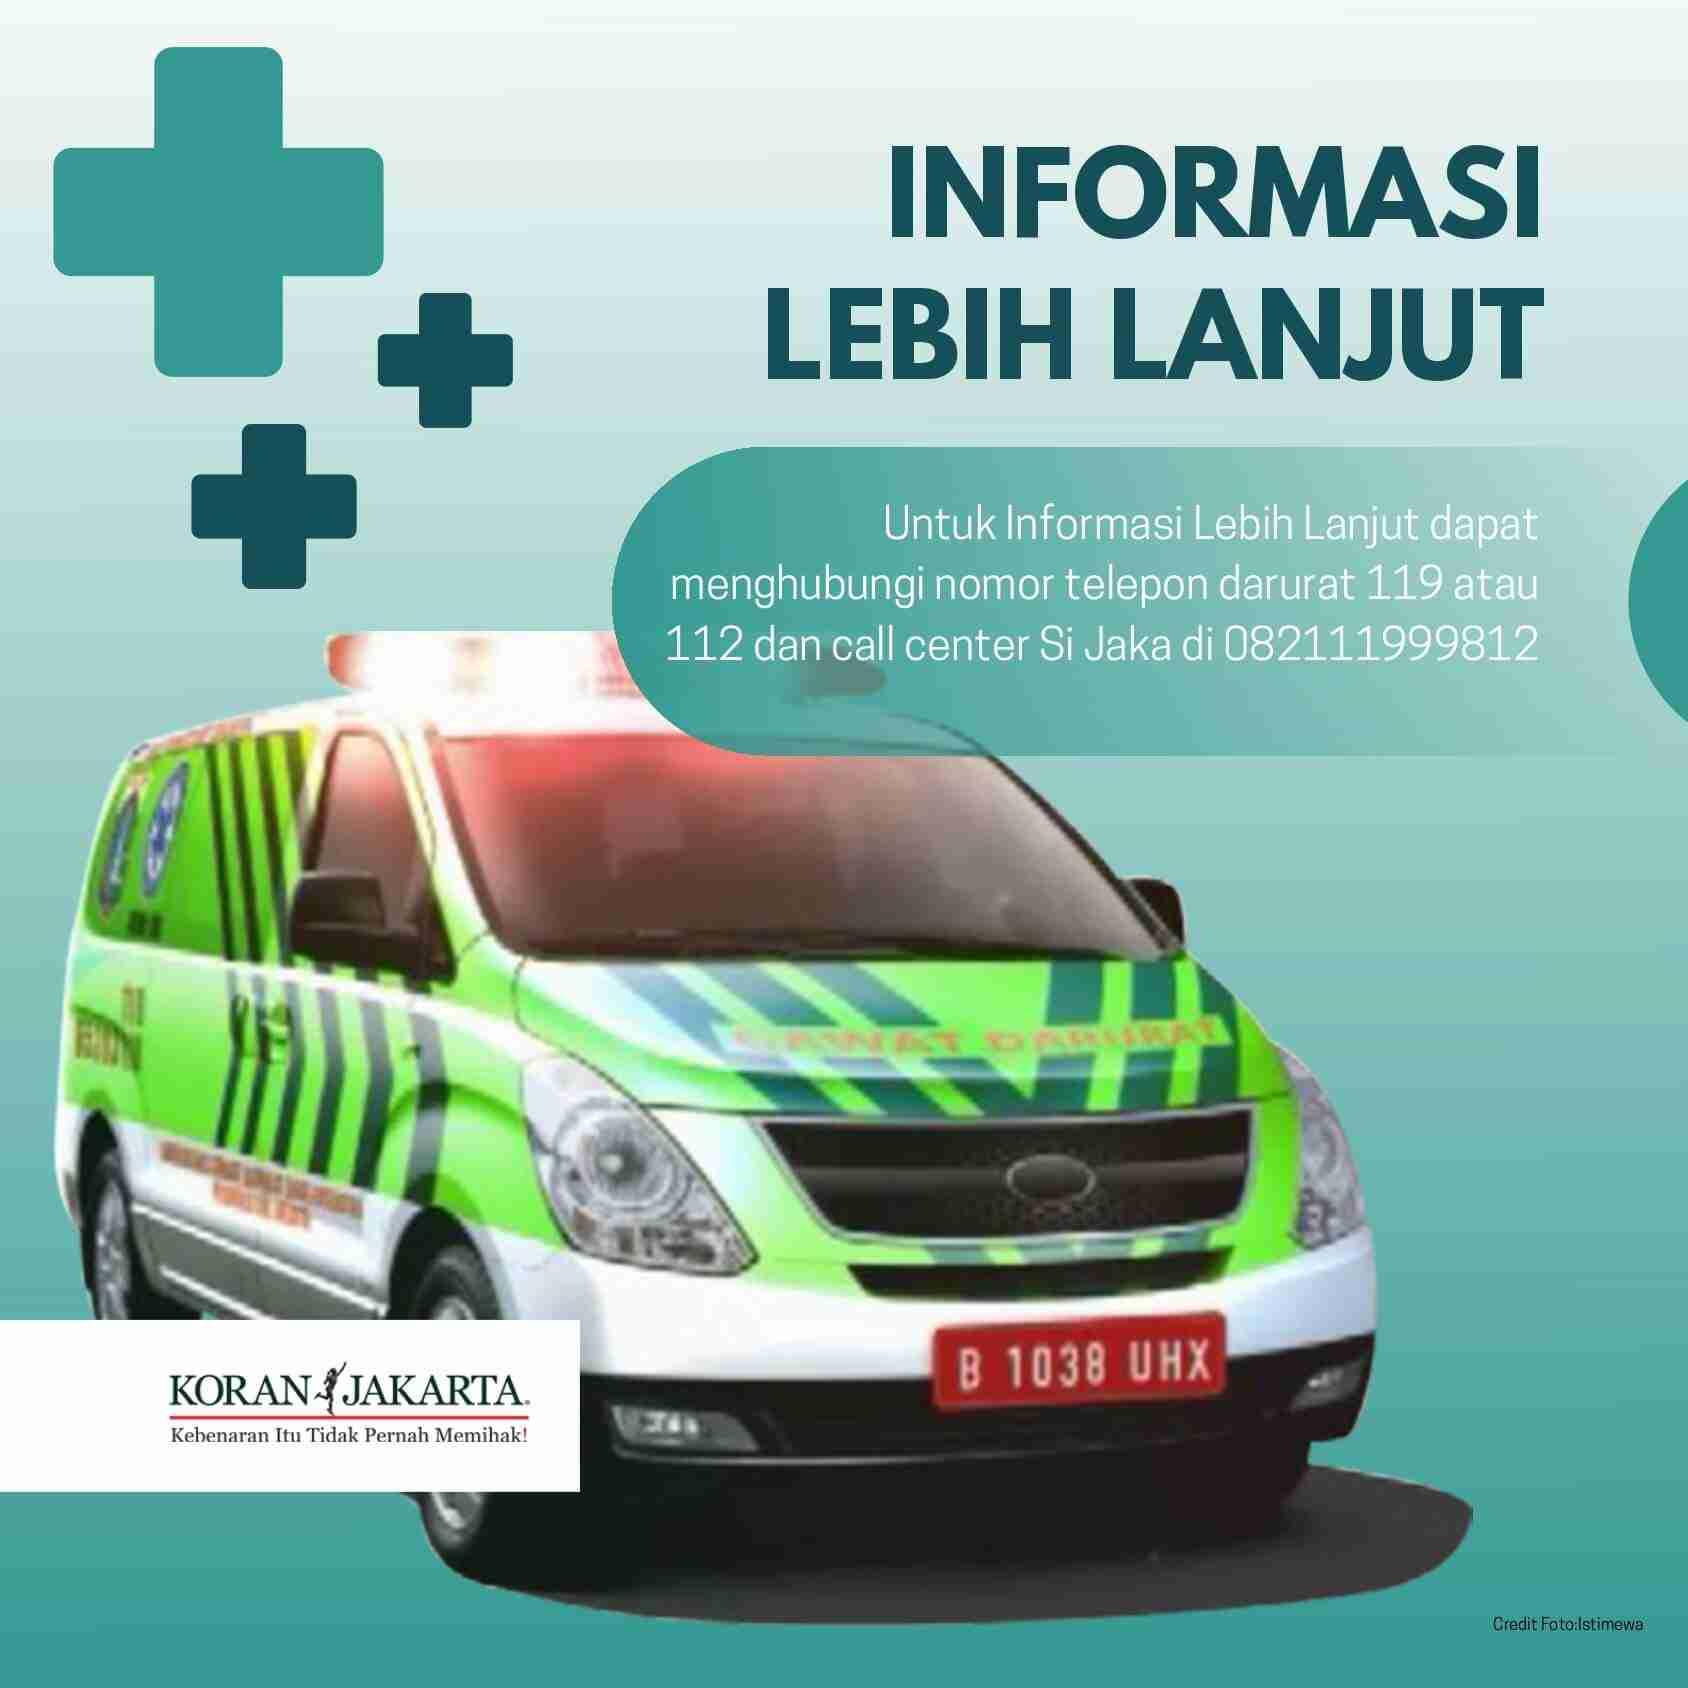 Jak Ambulans : Layanan Pemanggilan Ambulans Gawat Darurat 5